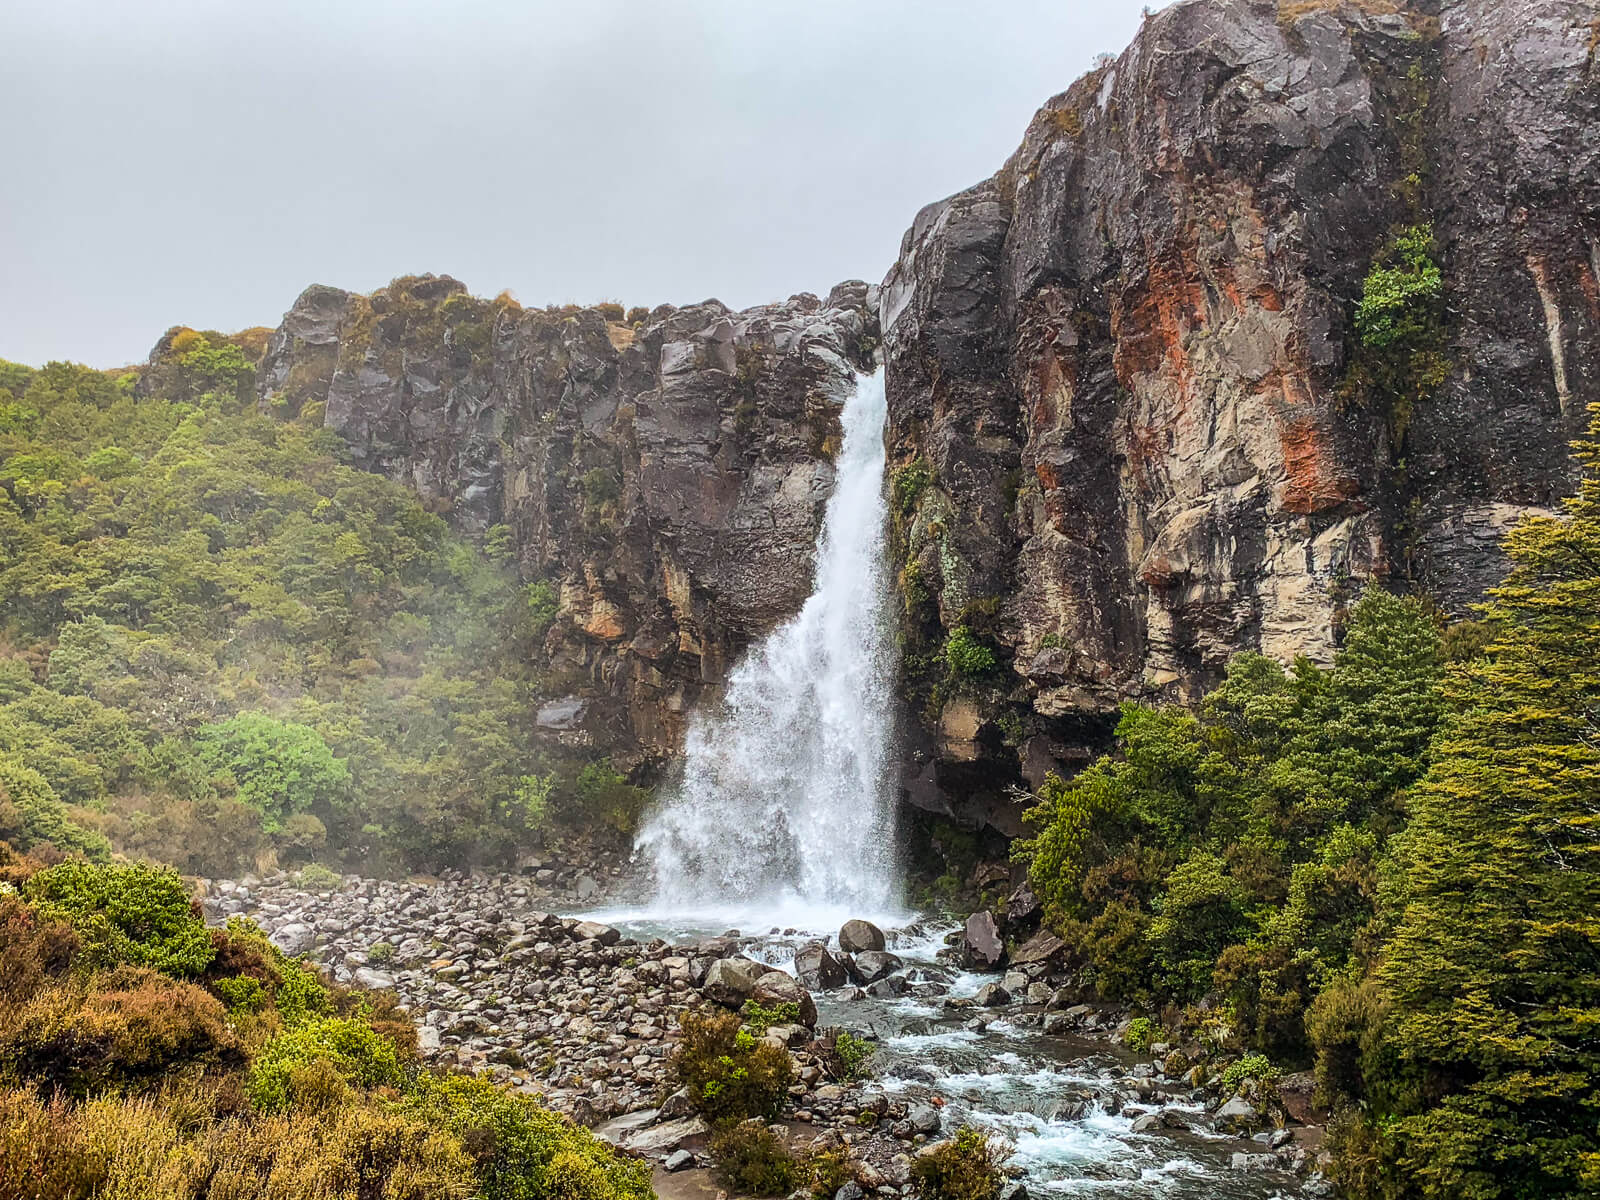 Daghikes Noodereiland - Taranaki Falls Tongariro National Park